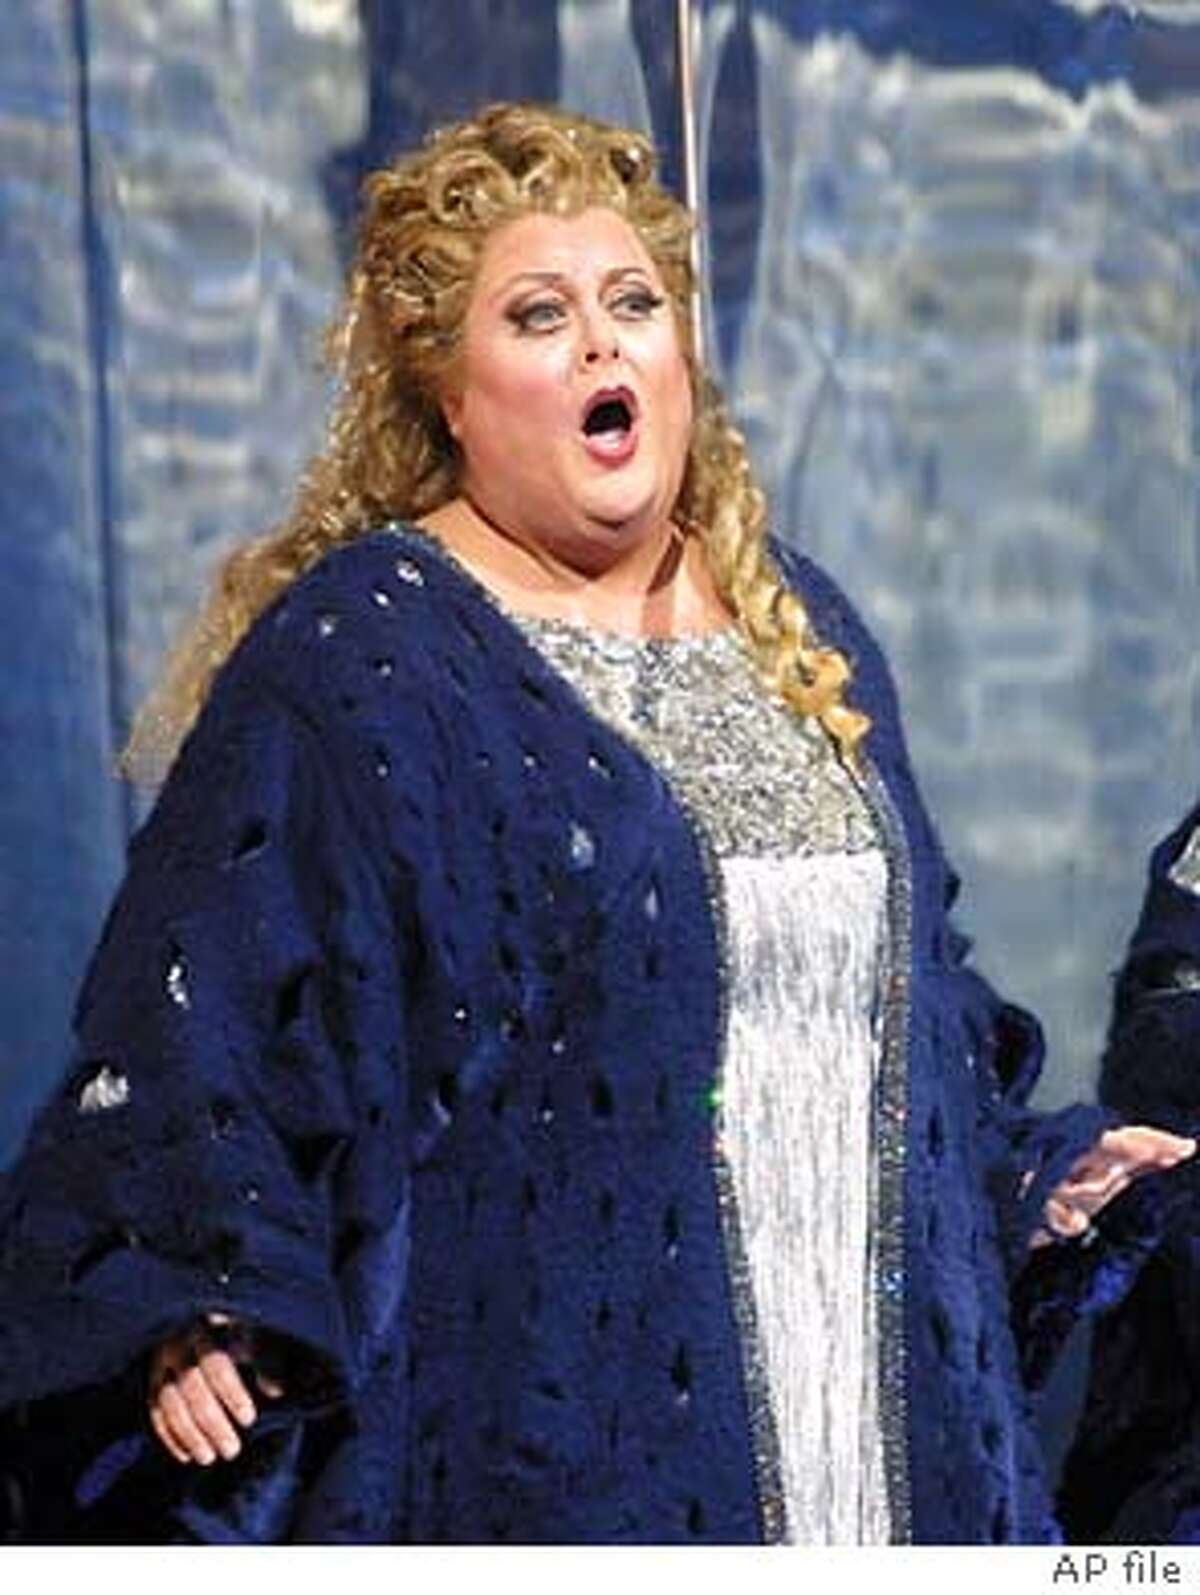 "Deborah Voigt sings during a dress rehearsal of the new Herbert Wernicke production of Strauss' opera, ""Die Frau ohne Schatten,"" Monday, Dec. 10, 2001, at the Metropolitan Opera in New York. (AP Photo/Shawn Baldwin)"